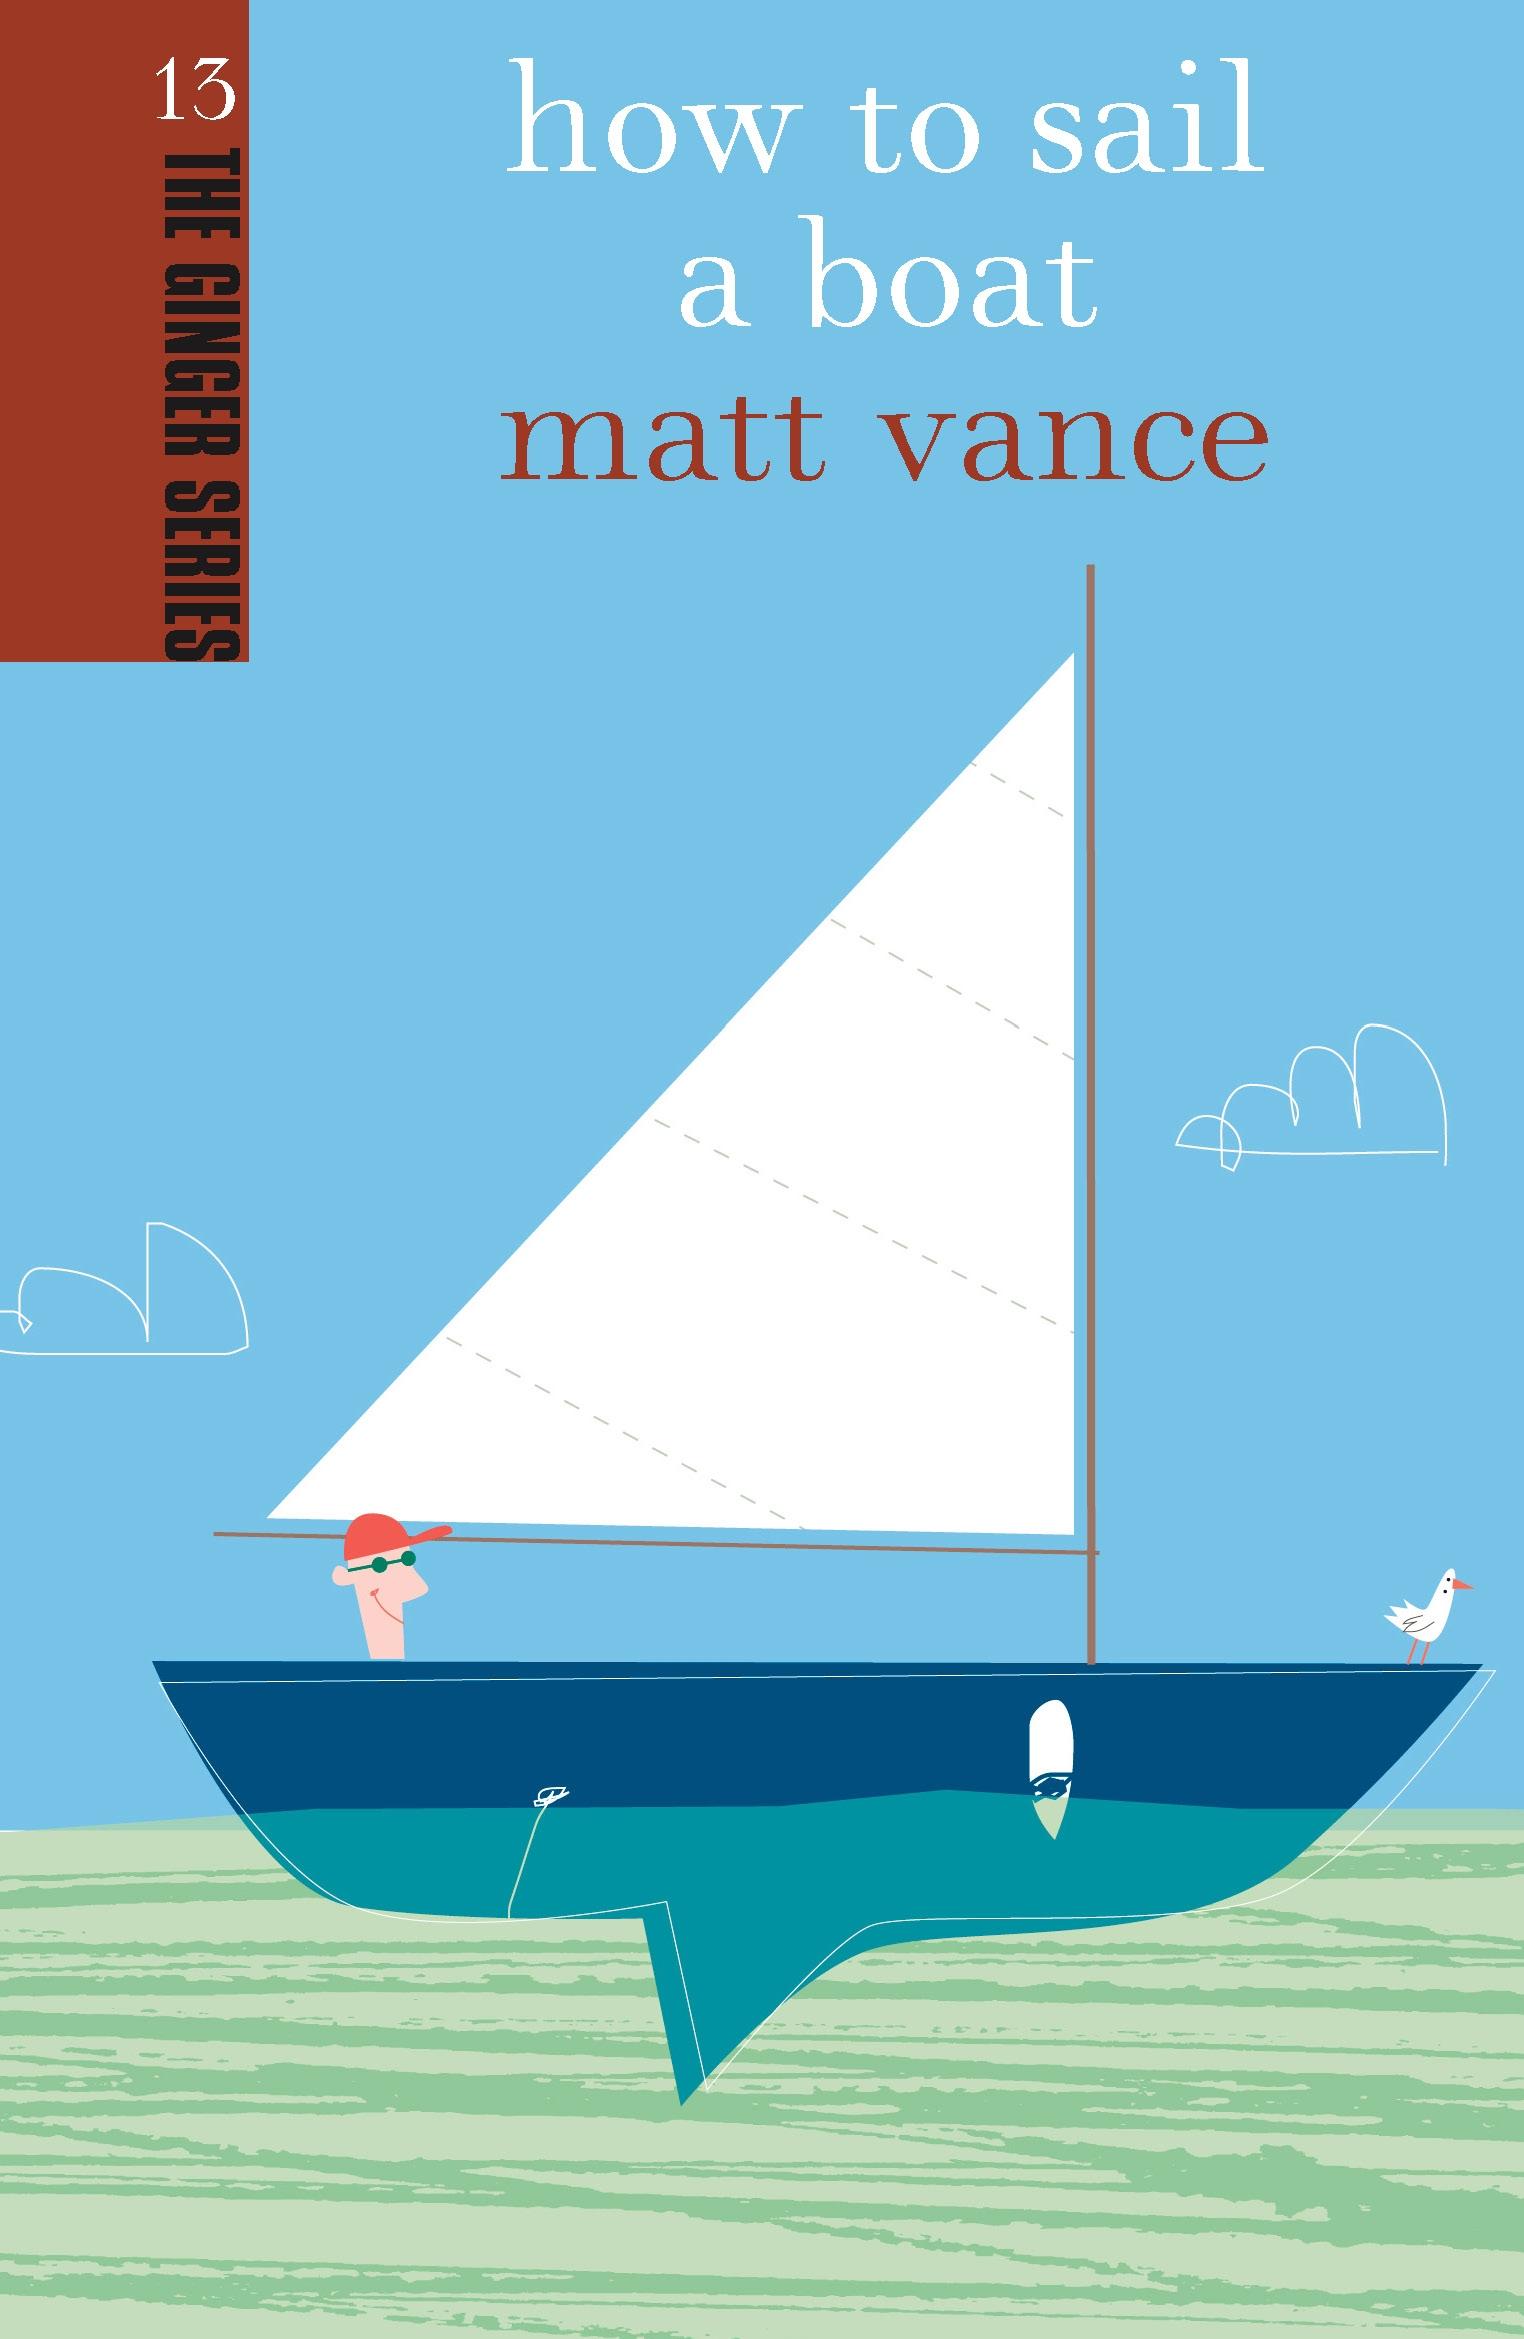 How-to-Sail-a-Boat-Ginger-Series-Vol-13-Vance-Matt